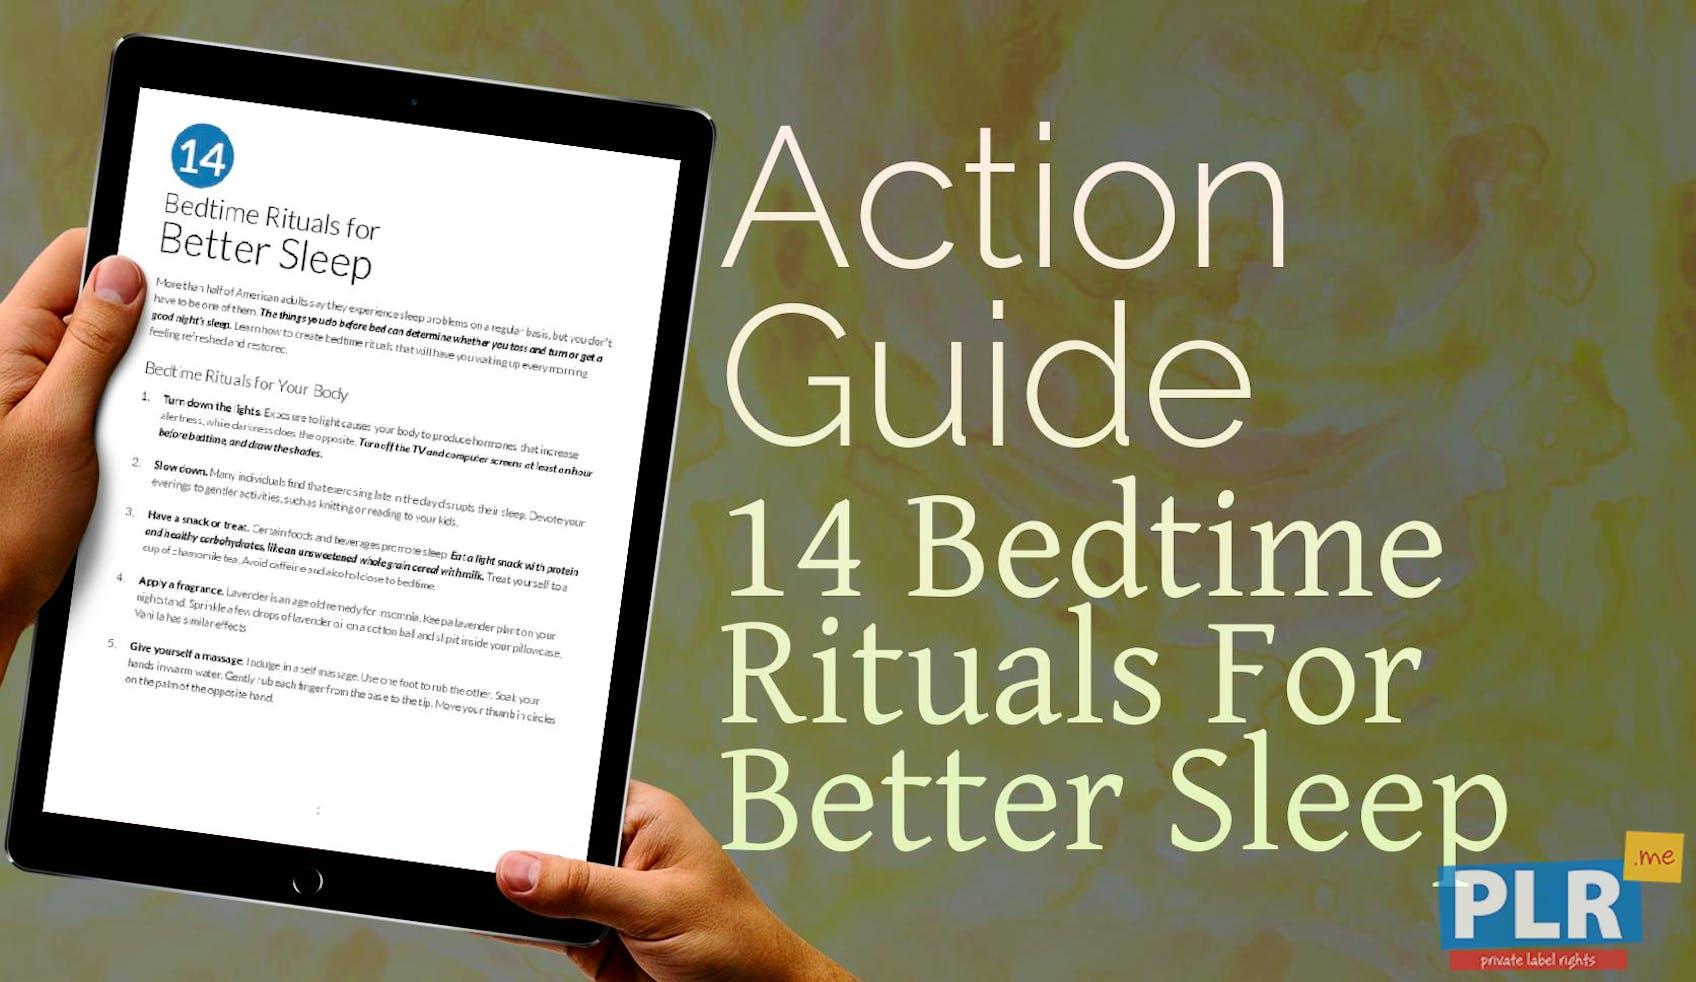 14 Bedtime Rituals For Better Sleep